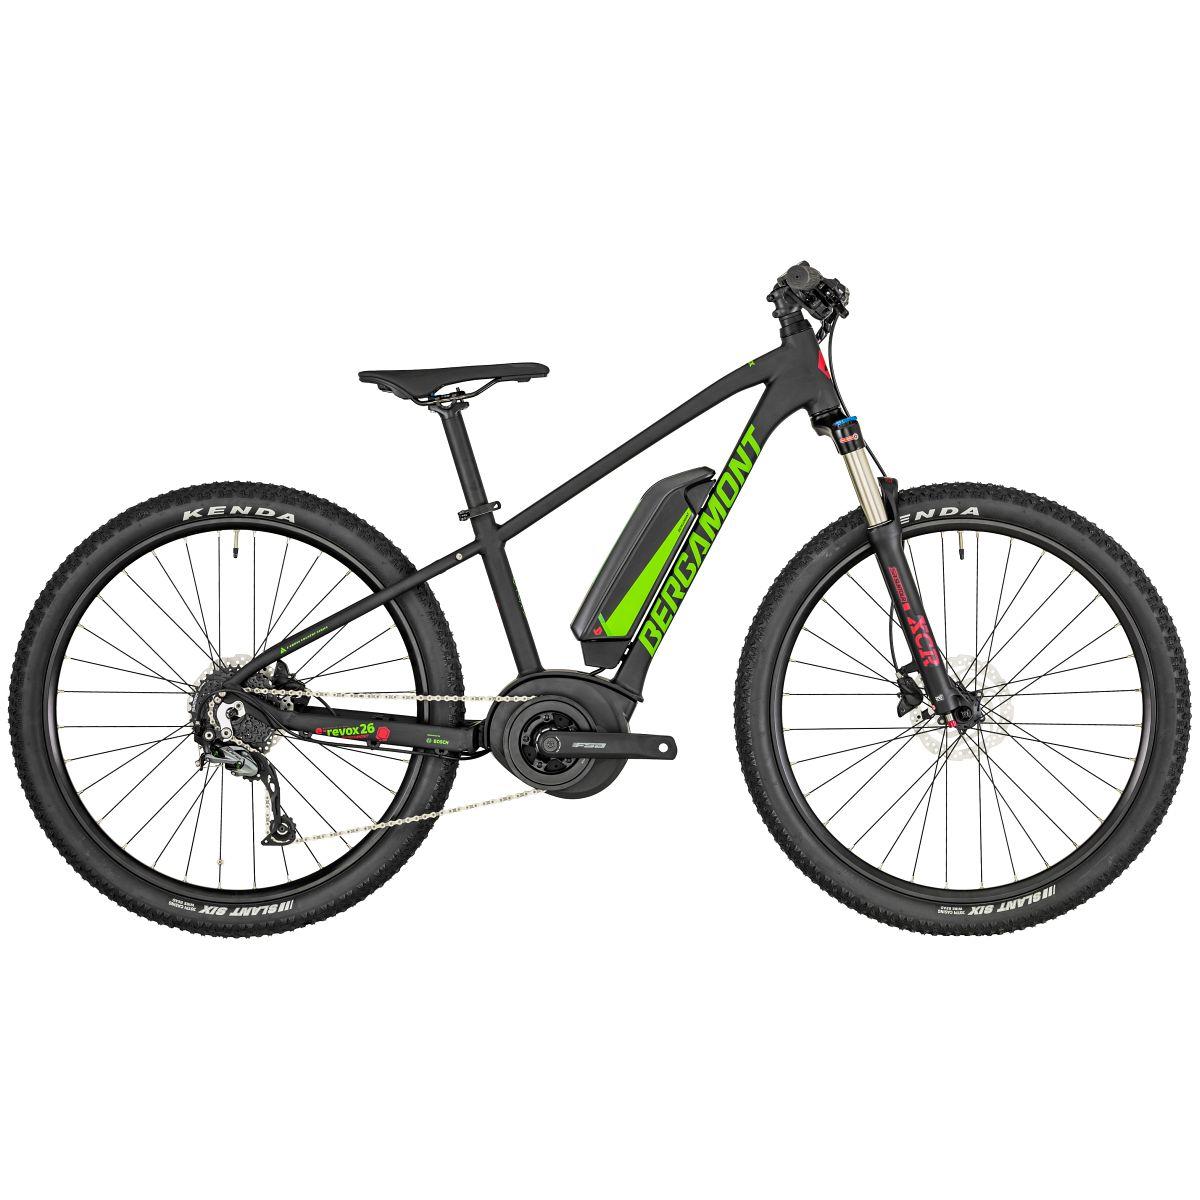 bergamont e revox 3 26 kinder pedelec elektro fahrrad gr. Black Bedroom Furniture Sets. Home Design Ideas